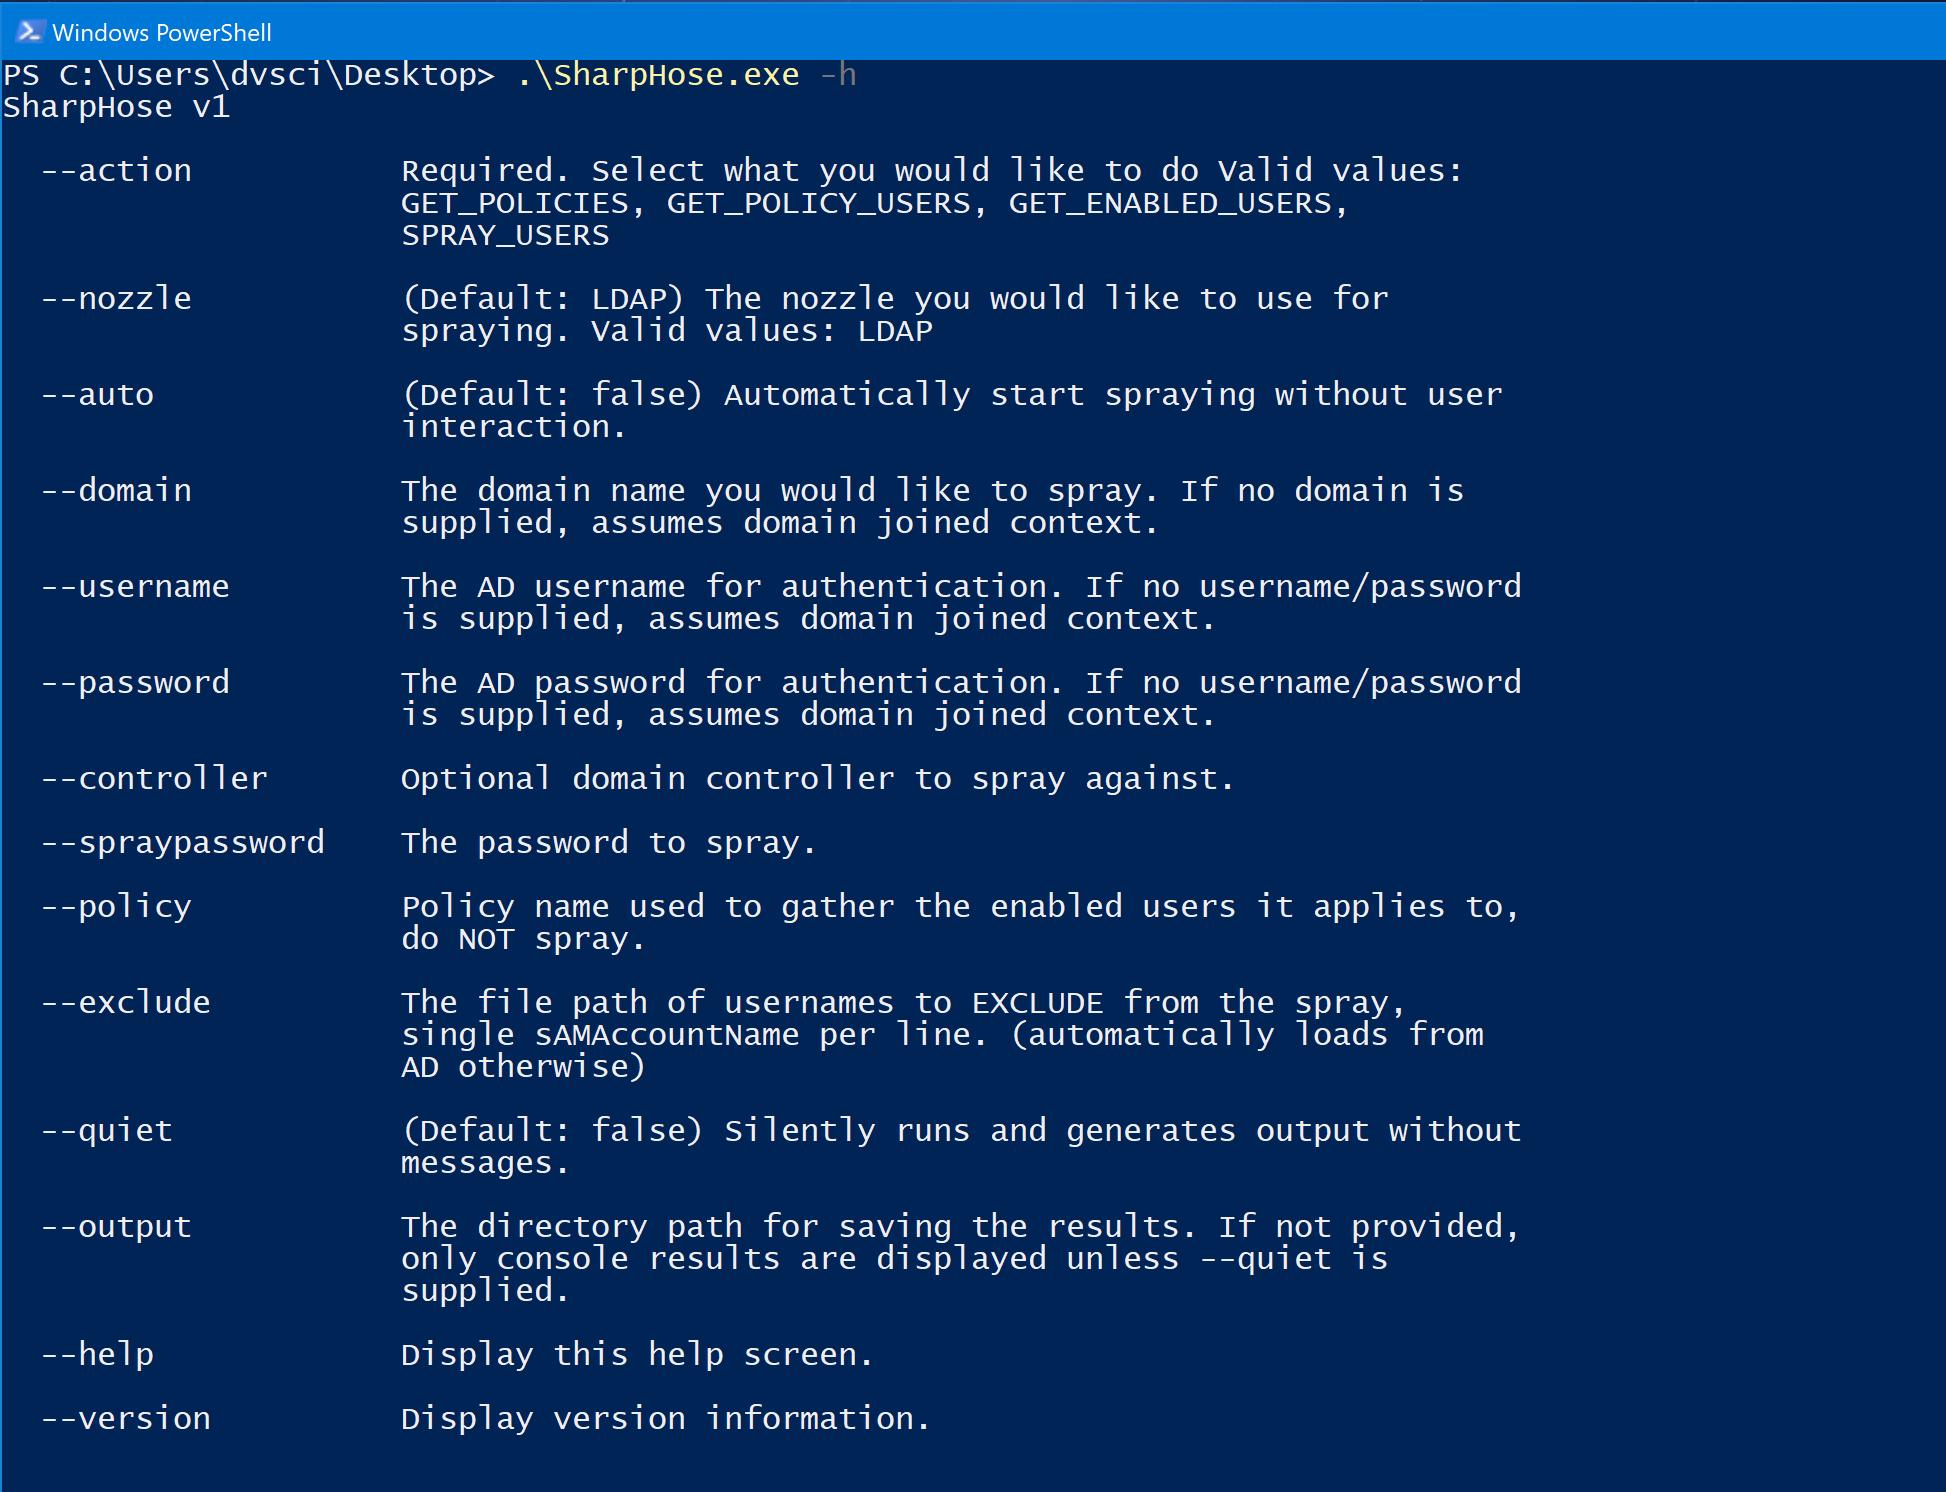 SharpHose: Asynchronous Password Spraying Tool in C#